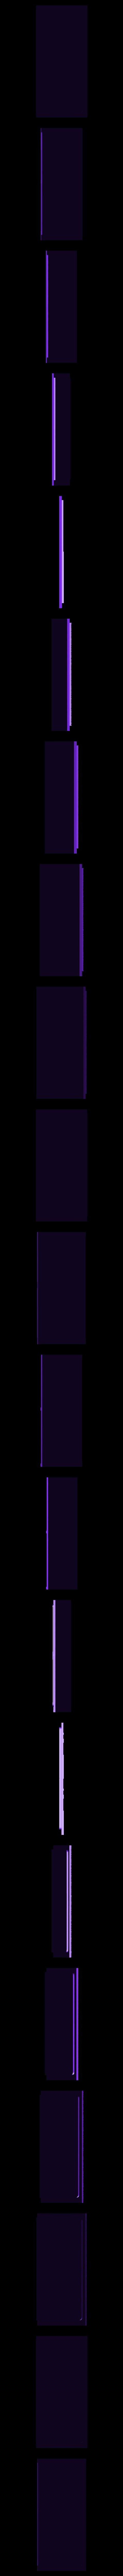 corner_lock_part5.stl Download free STL file Door Handles • Object to 3D print, Job